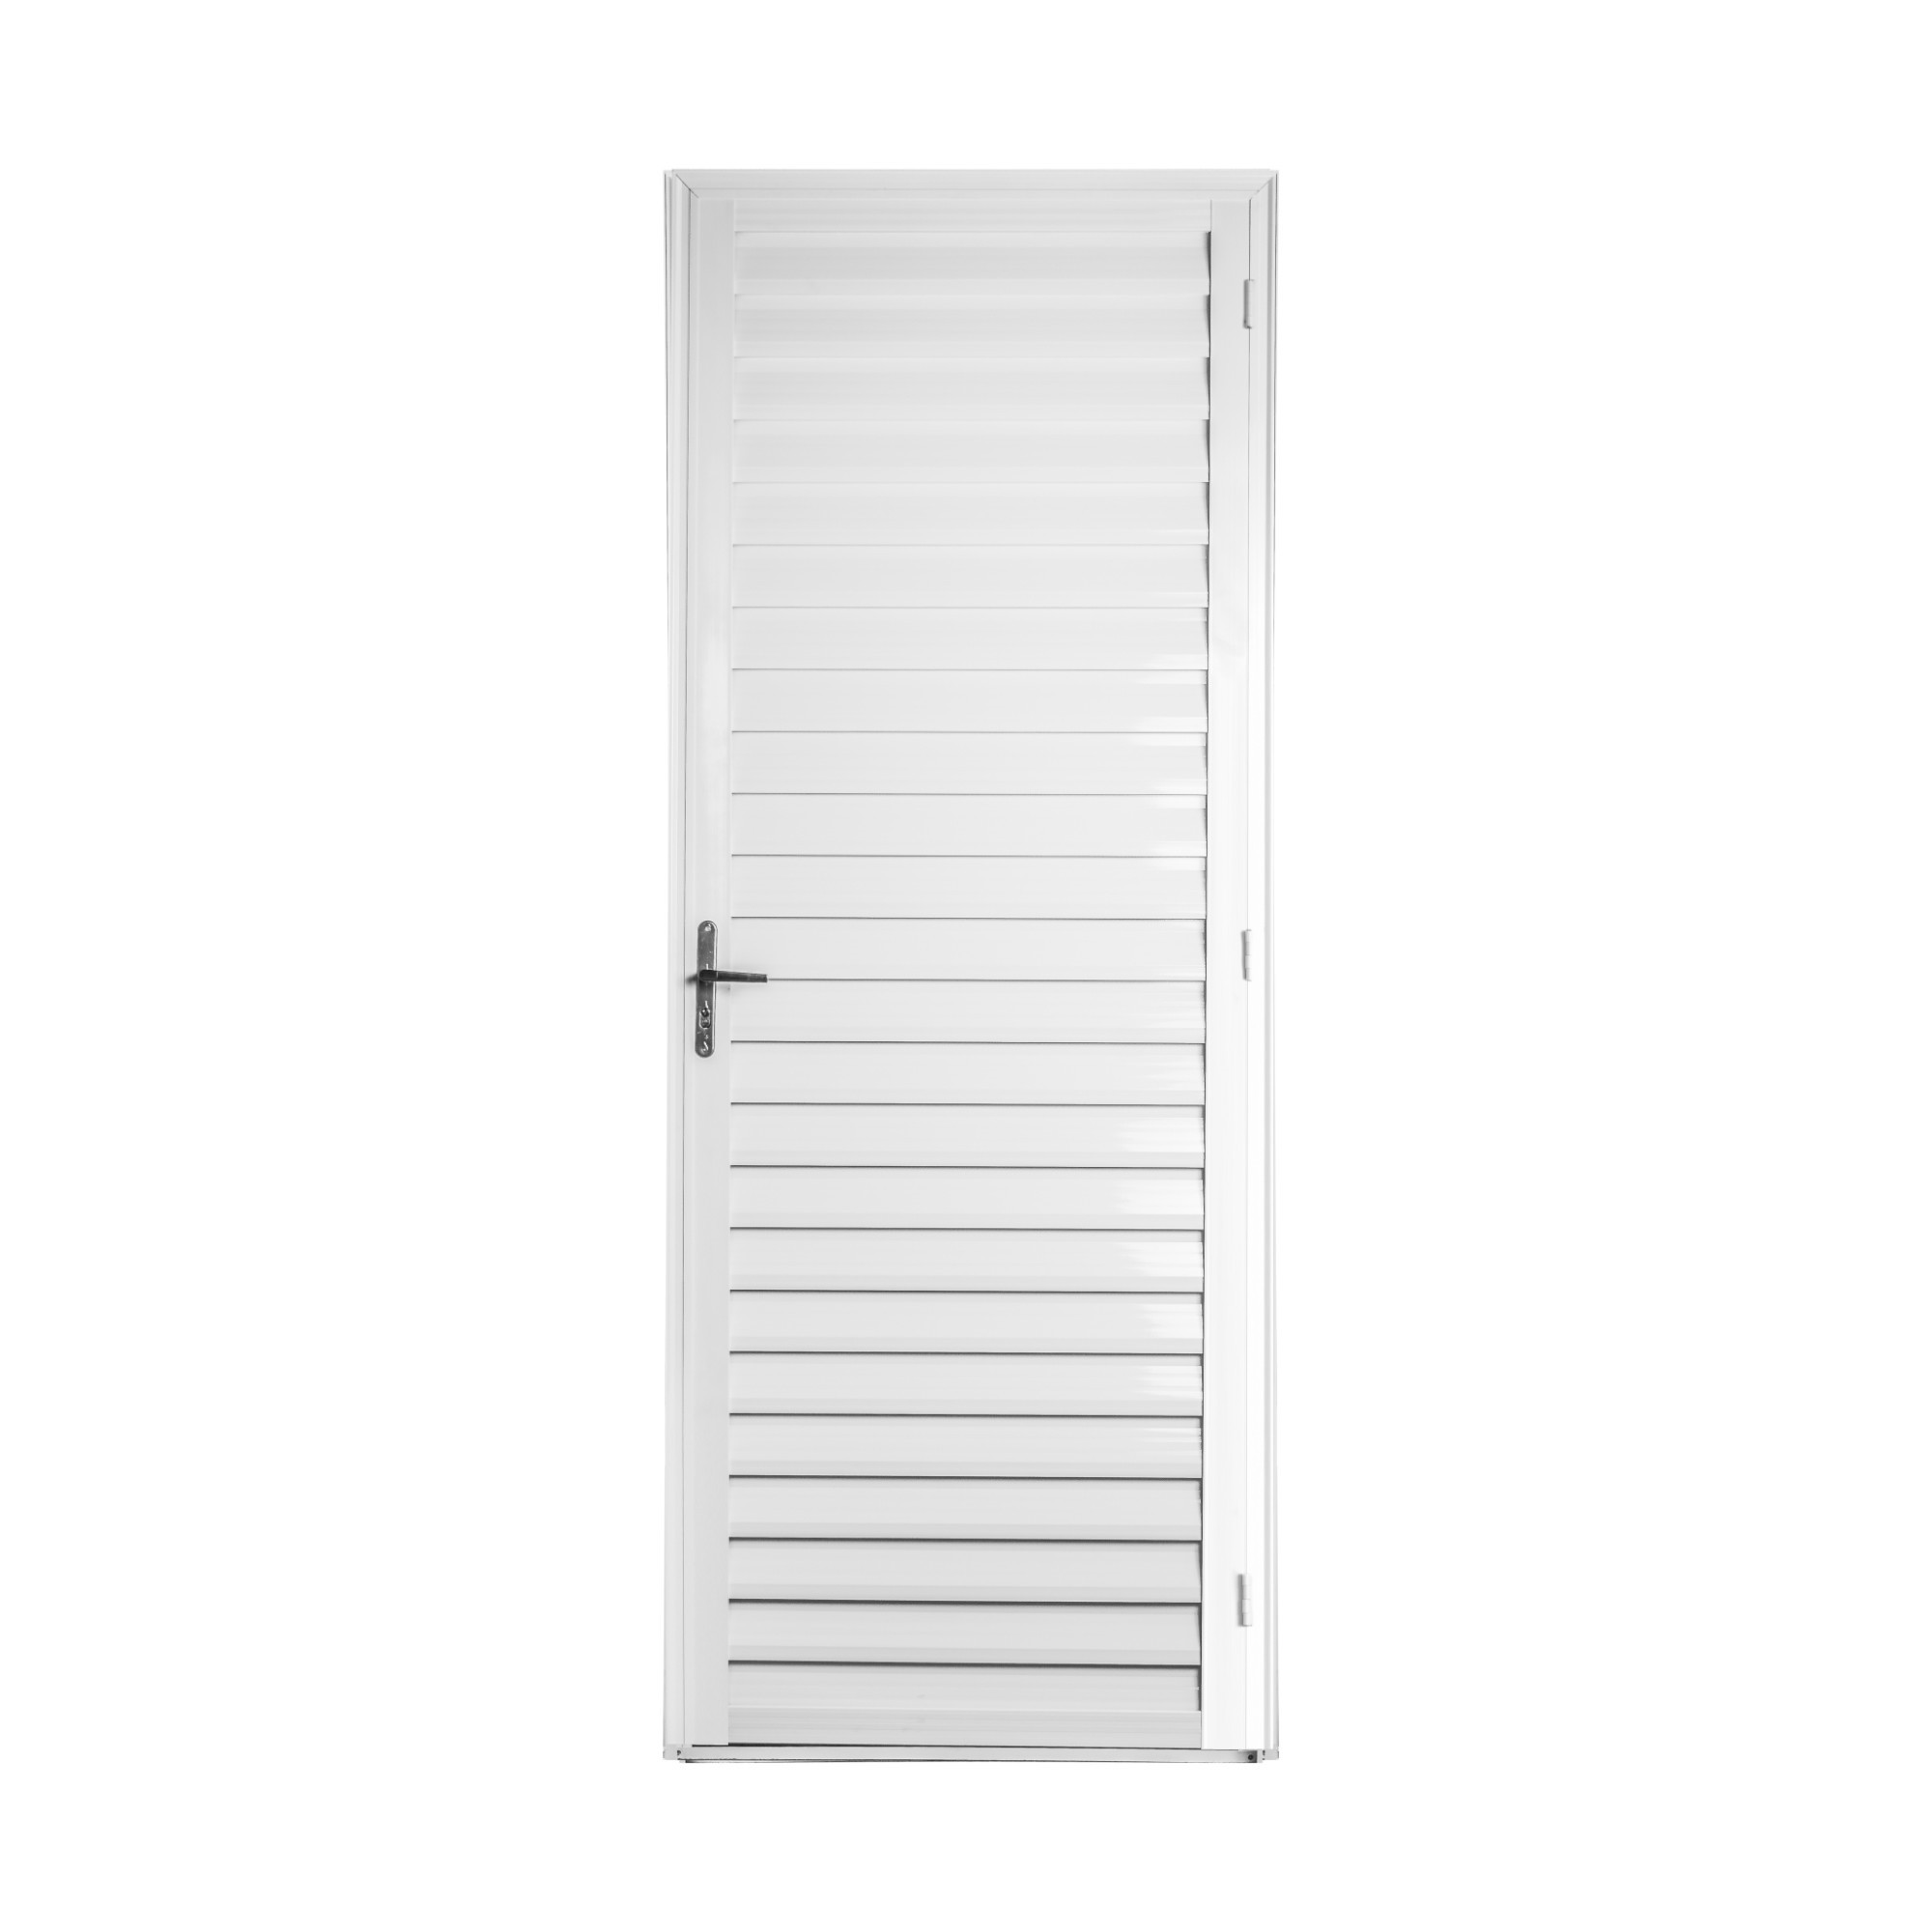 Porta de Abrir de Aluminio 210cm x 80cm Veneziana Metalflex Lado Esquerdo - Aluvid